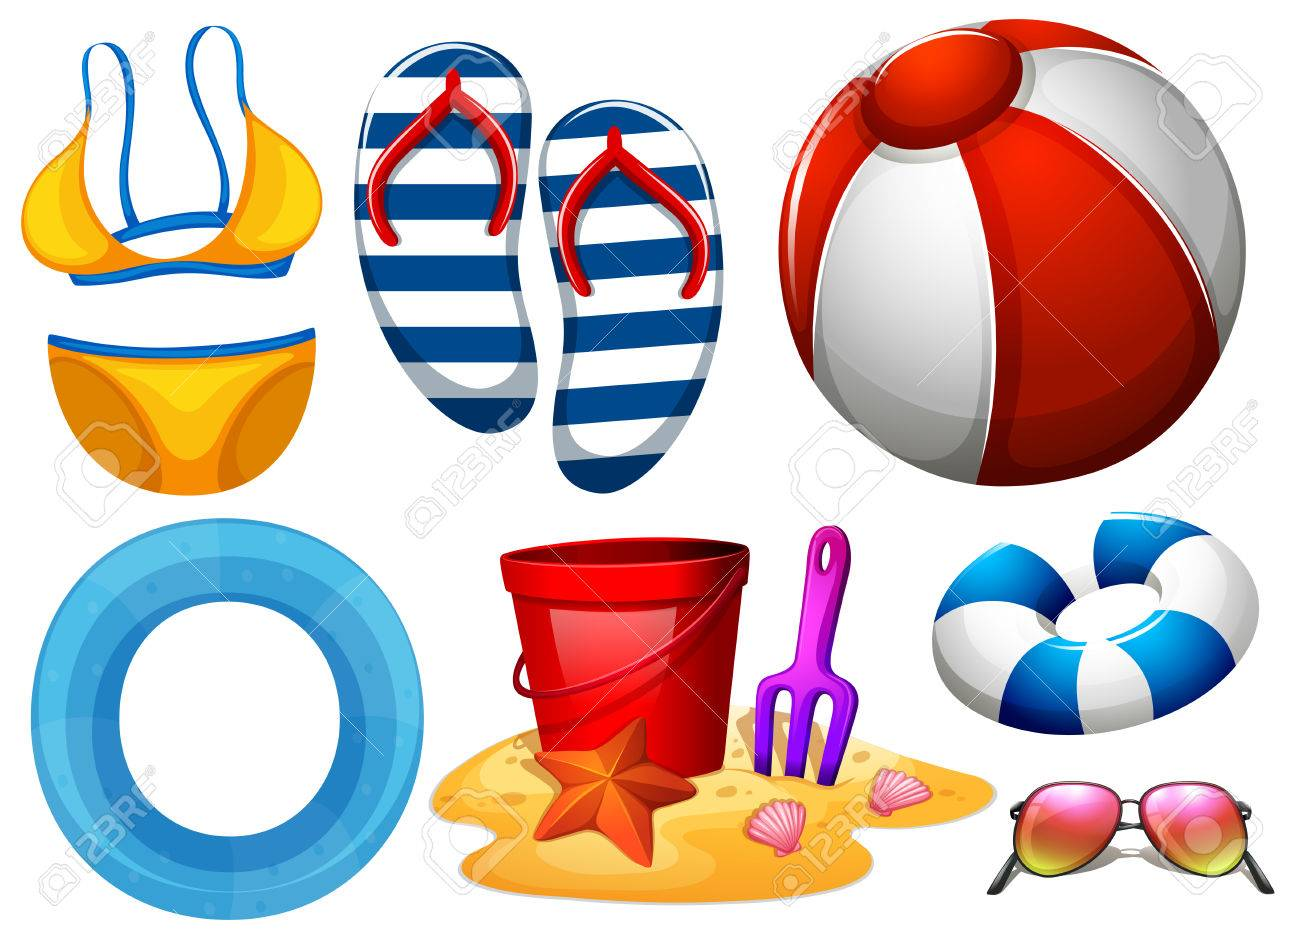 Beachwear and other beach toys illustration.